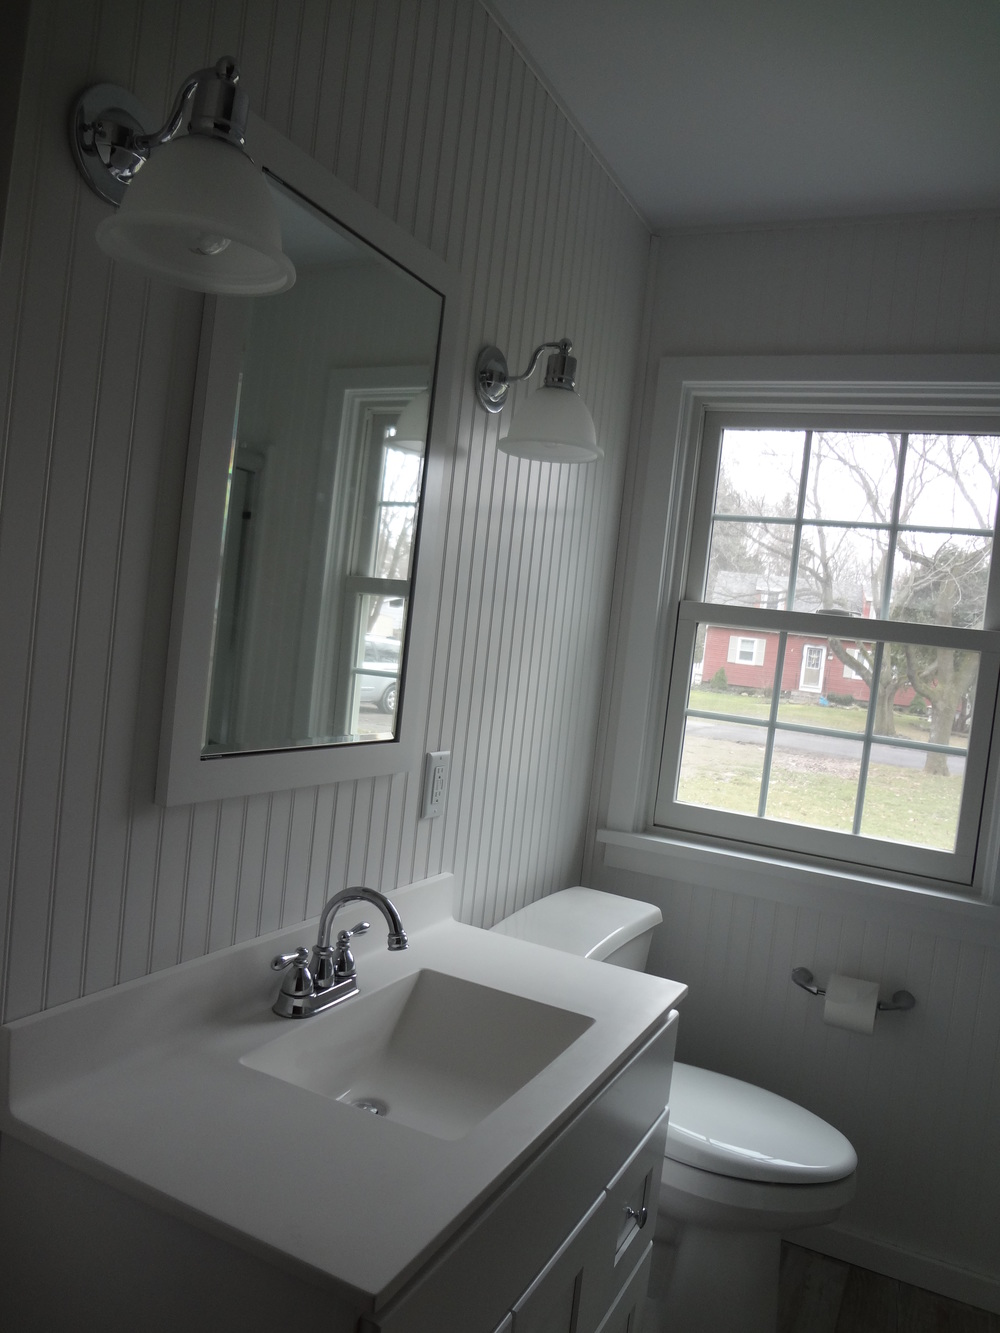 Spencerport, NY bathroom remodel by D'Angelo's Plumbing & Heating.